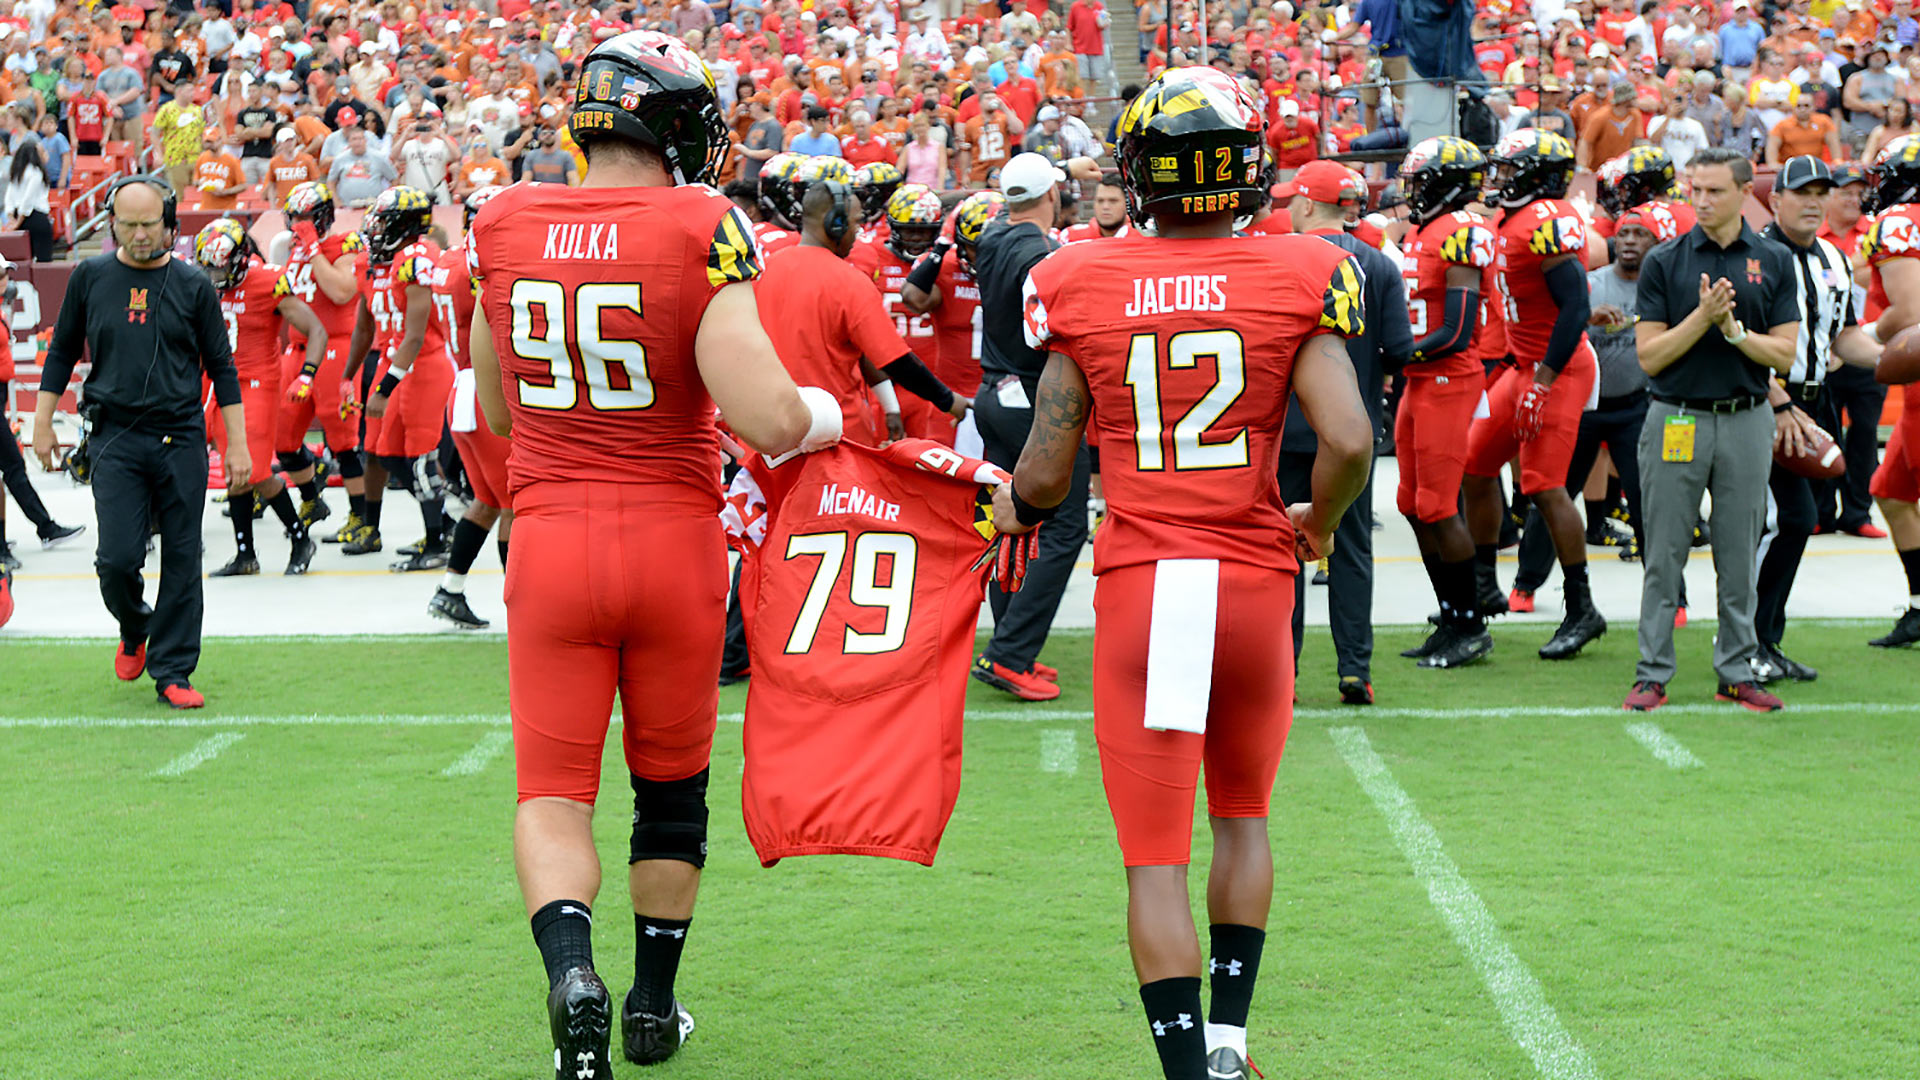 Jordan McNair Jersey carried by Maryland Football Teammates